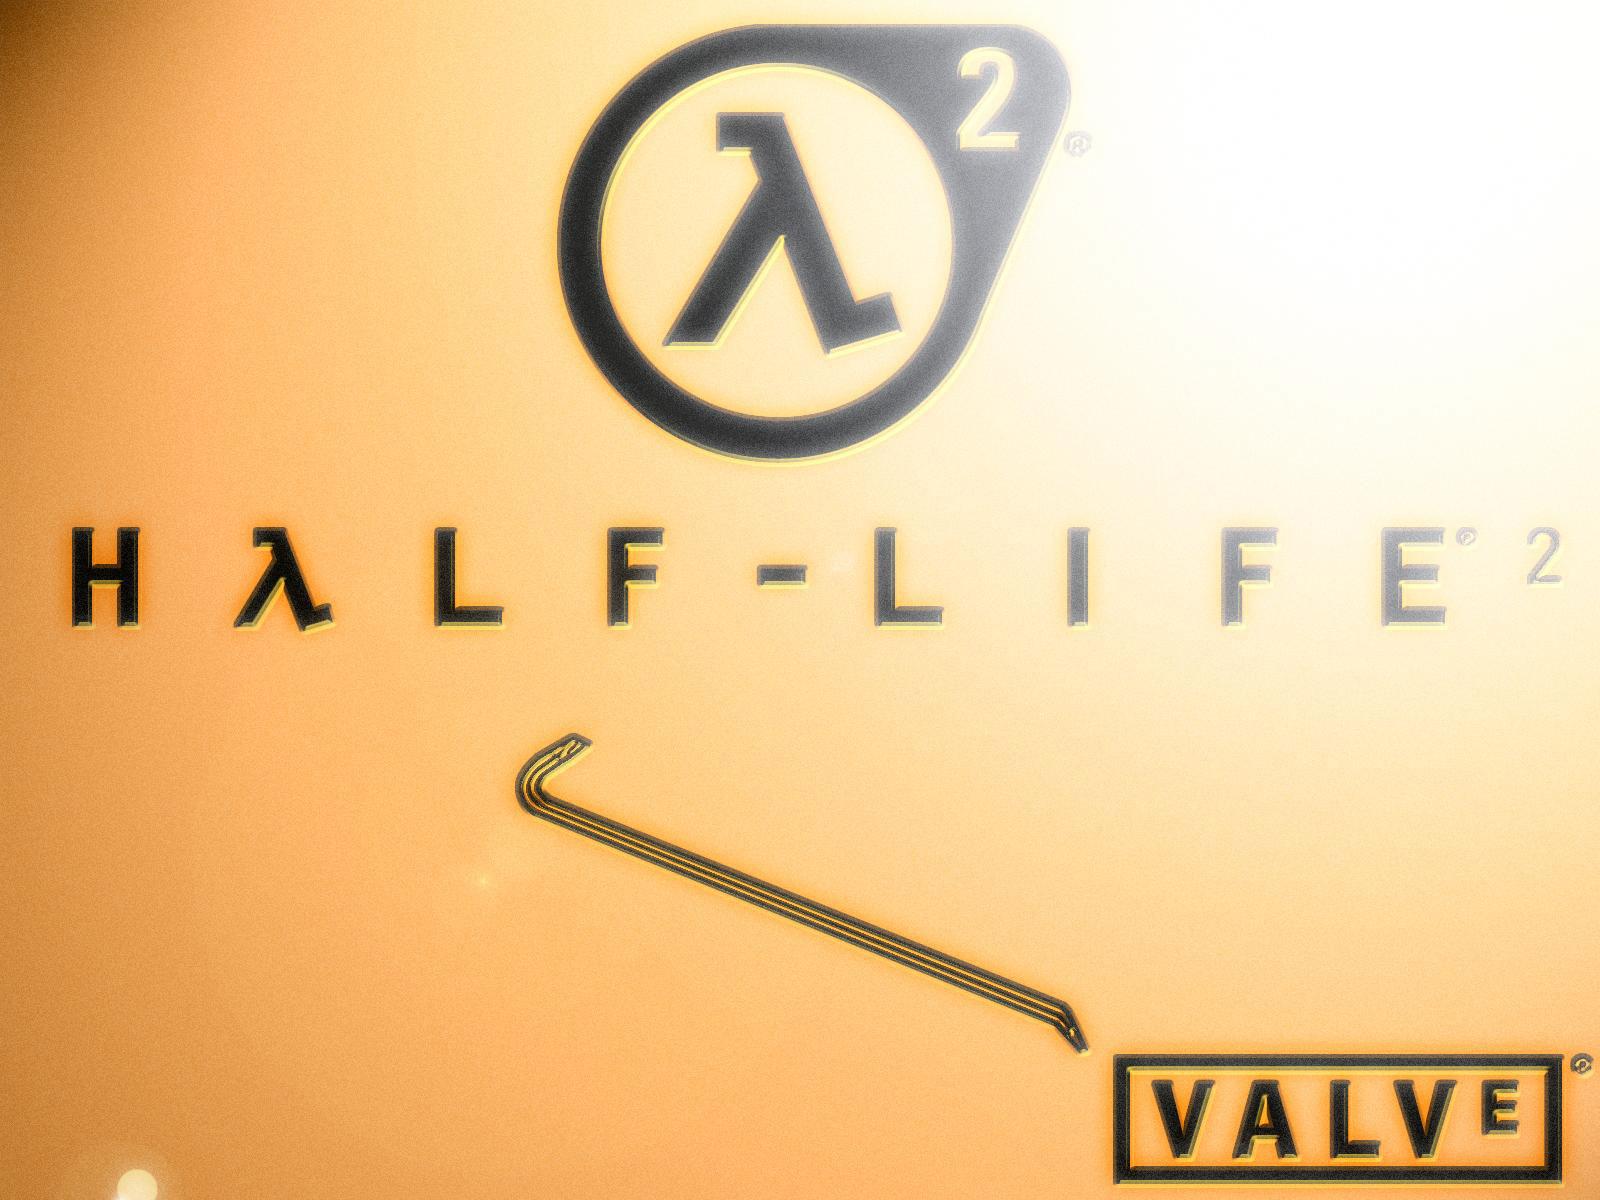 Half life 2 3d pron nude download